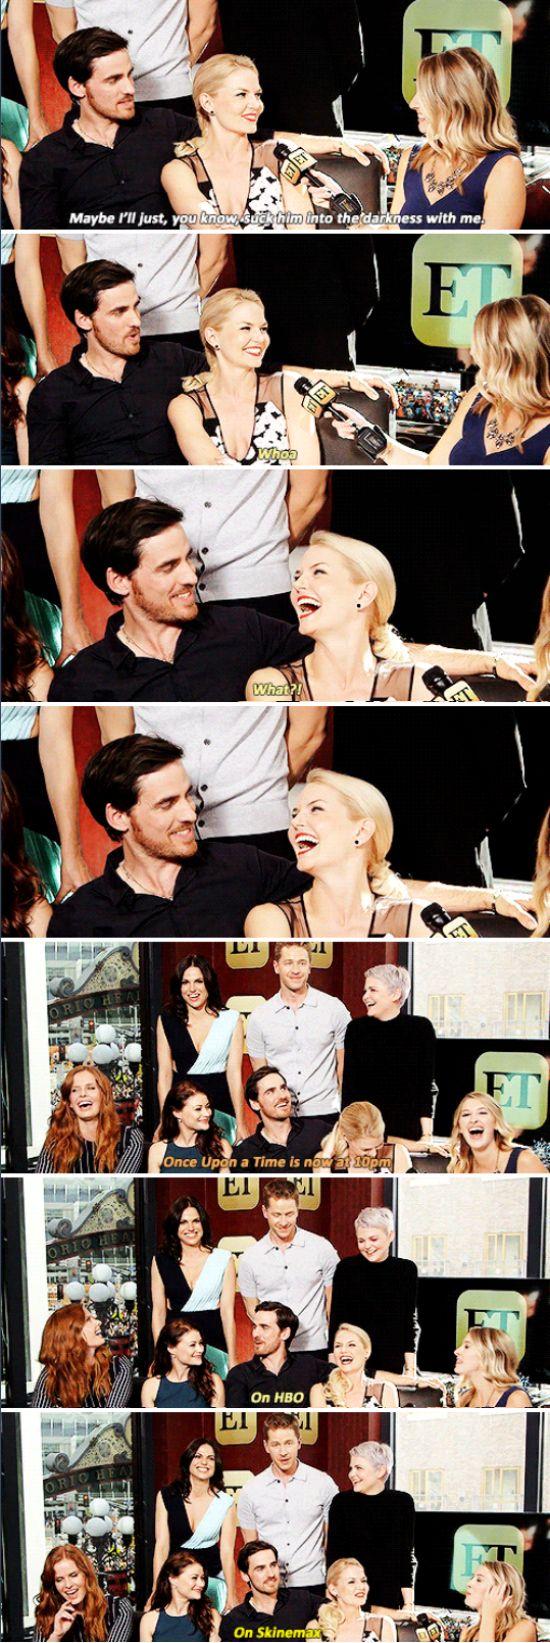 Jennifer, Colin, Lana, Josh, Ginnifer, Rebecca and Emilie - ET interview (pinned 11/10)